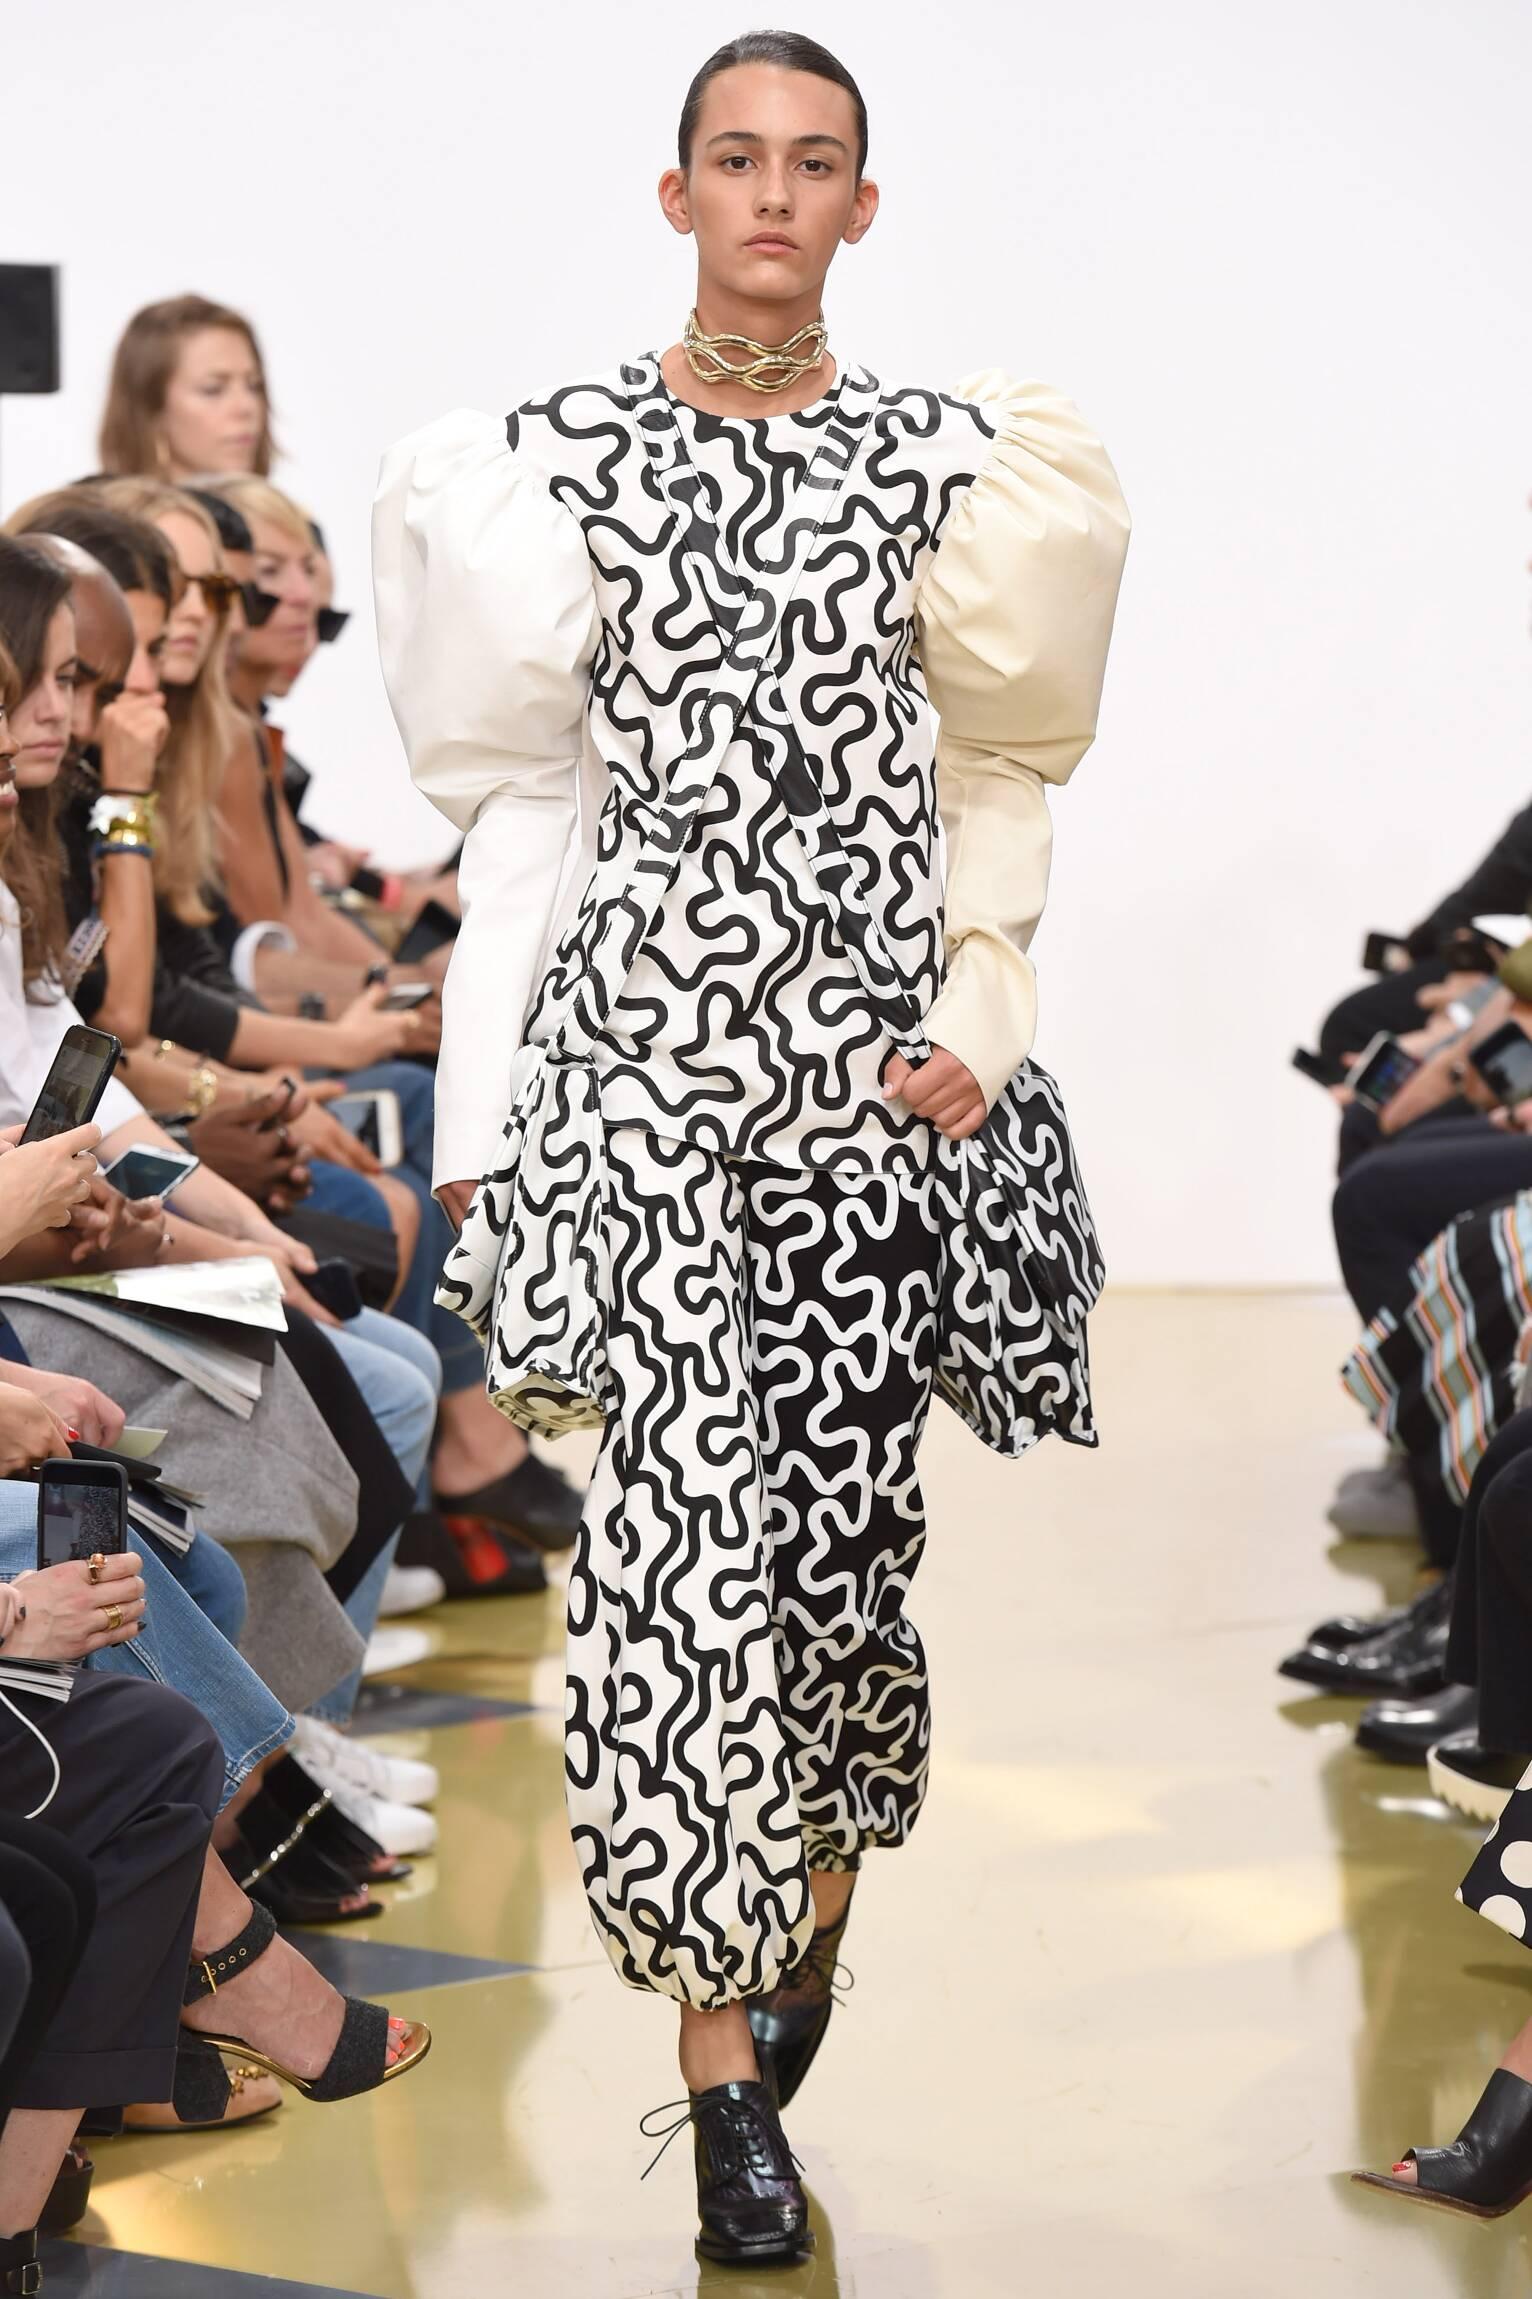 2016 Fashion Woman Model J.W. Anderson Collection Catwalk